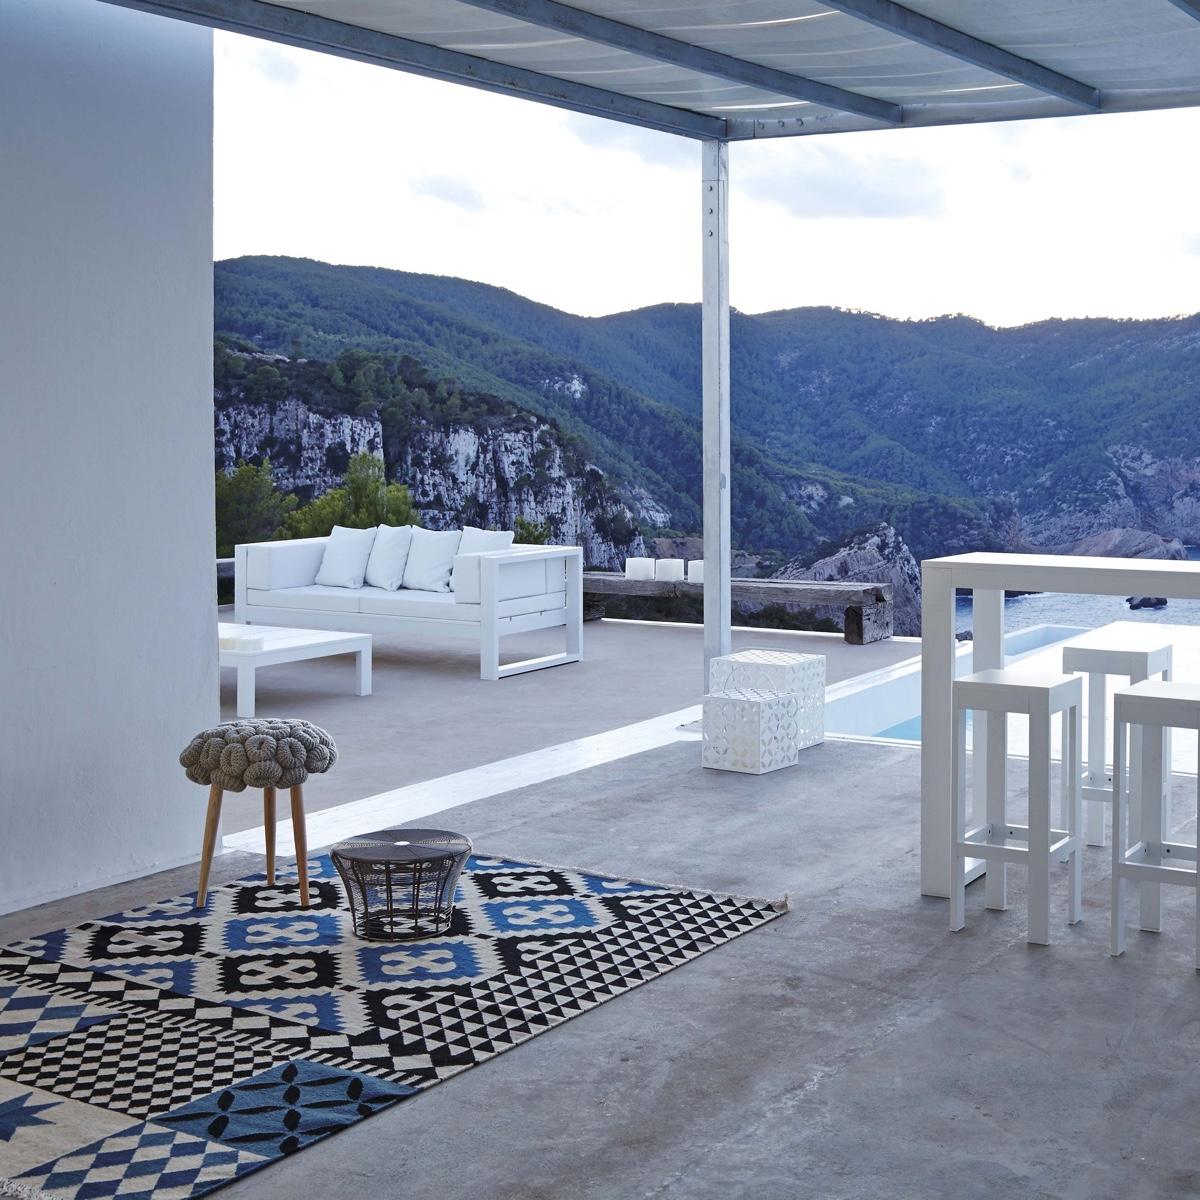 Palermo kilim bySandra Figuerola.Image courtesy ofGandía Blasco SA.